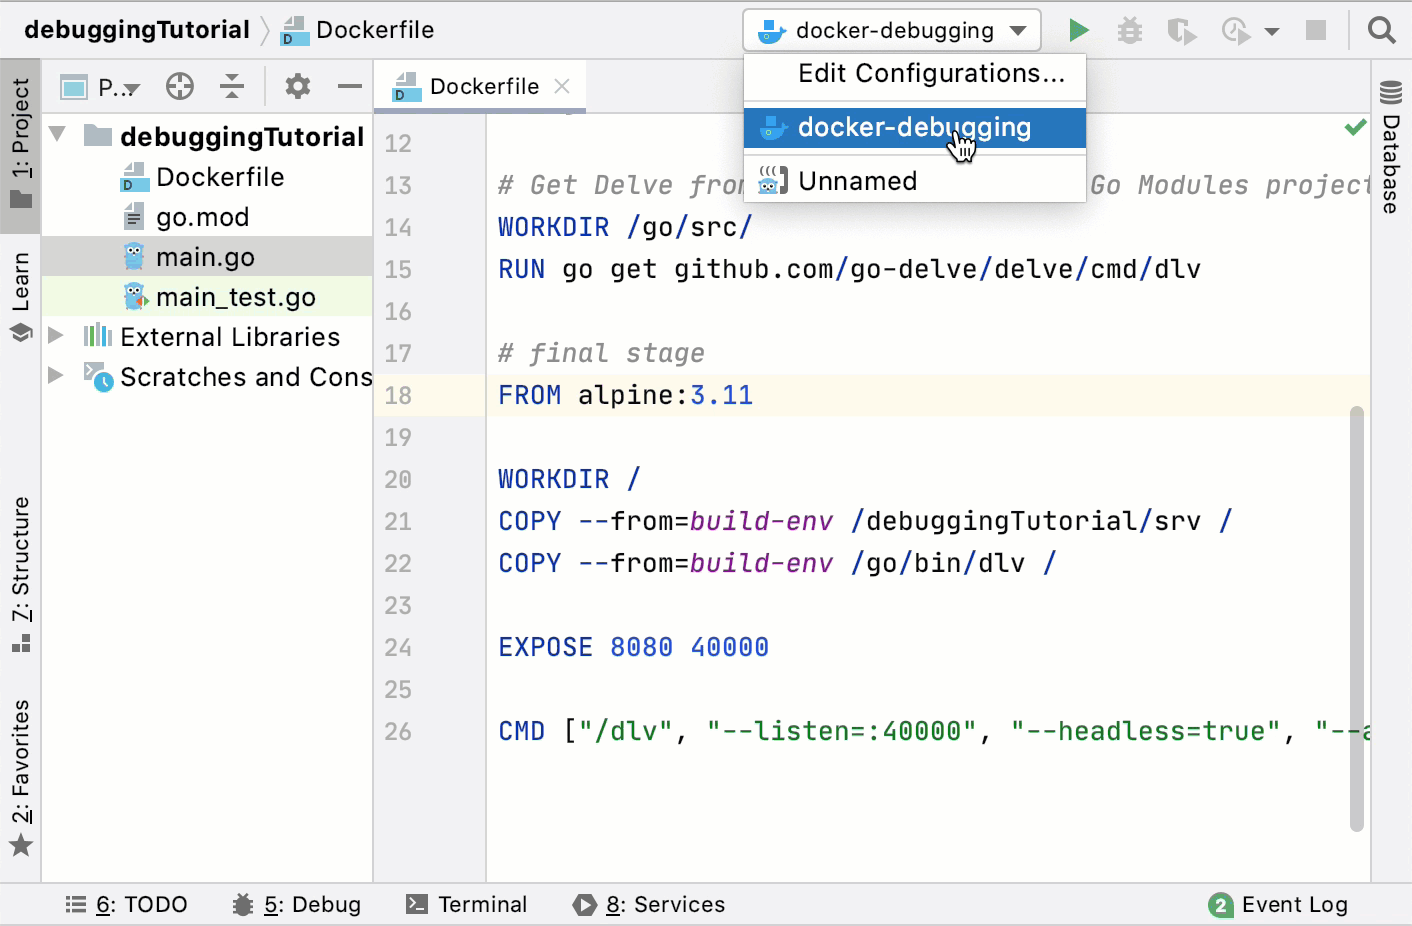 Run the Dockerfile configuration